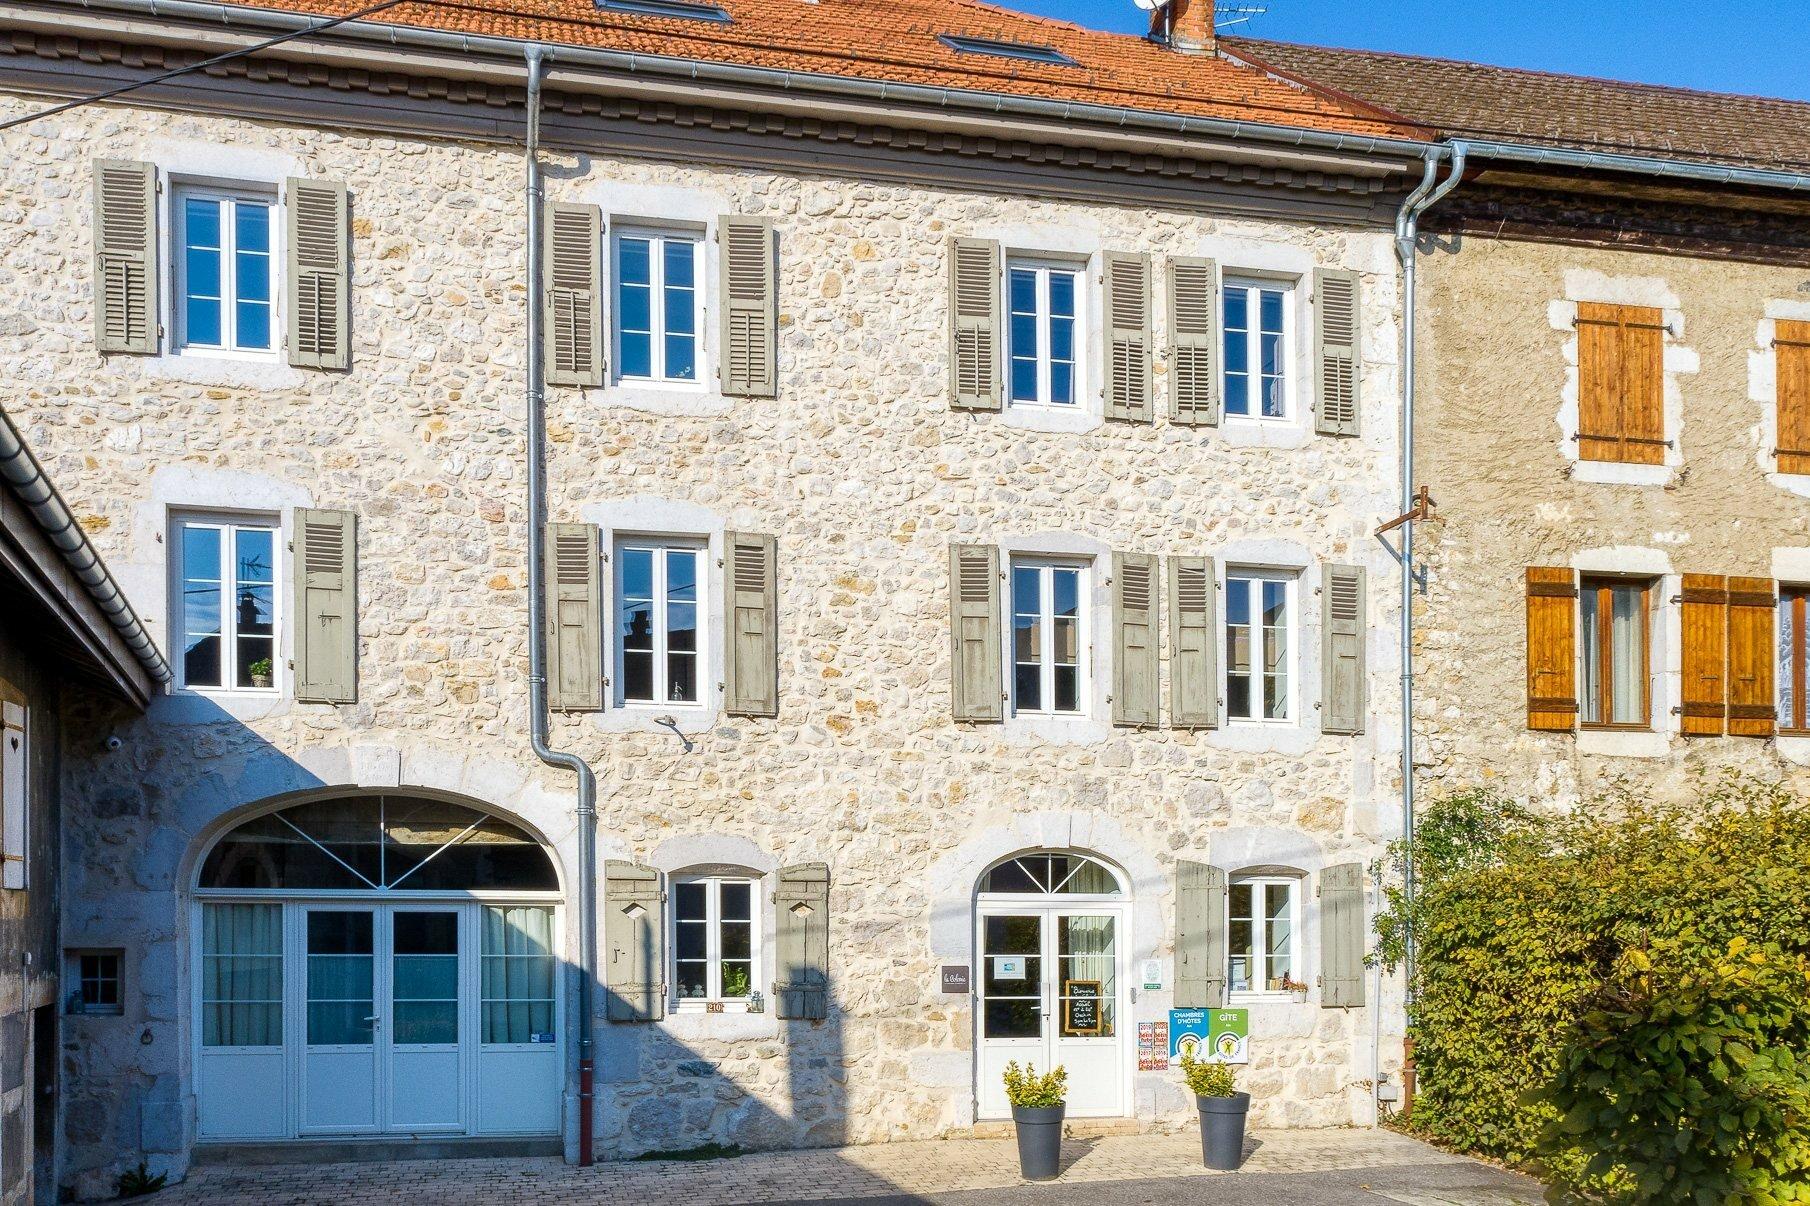 House in Collonges, Auvergne-Rhône-Alpes, France 1